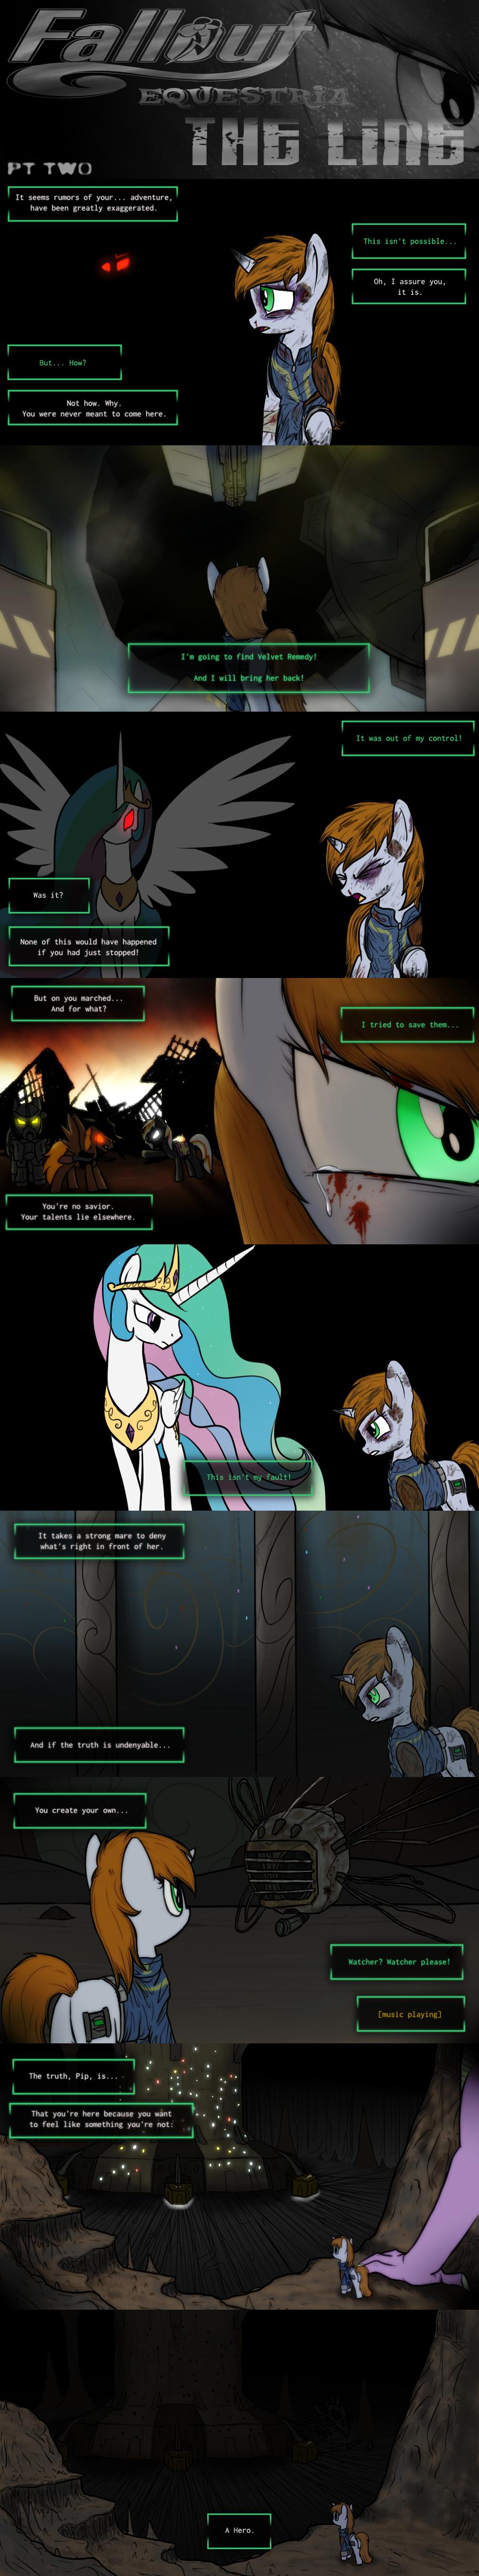 COMMISSION - Fallout Equestria: The Line (Pt 2)